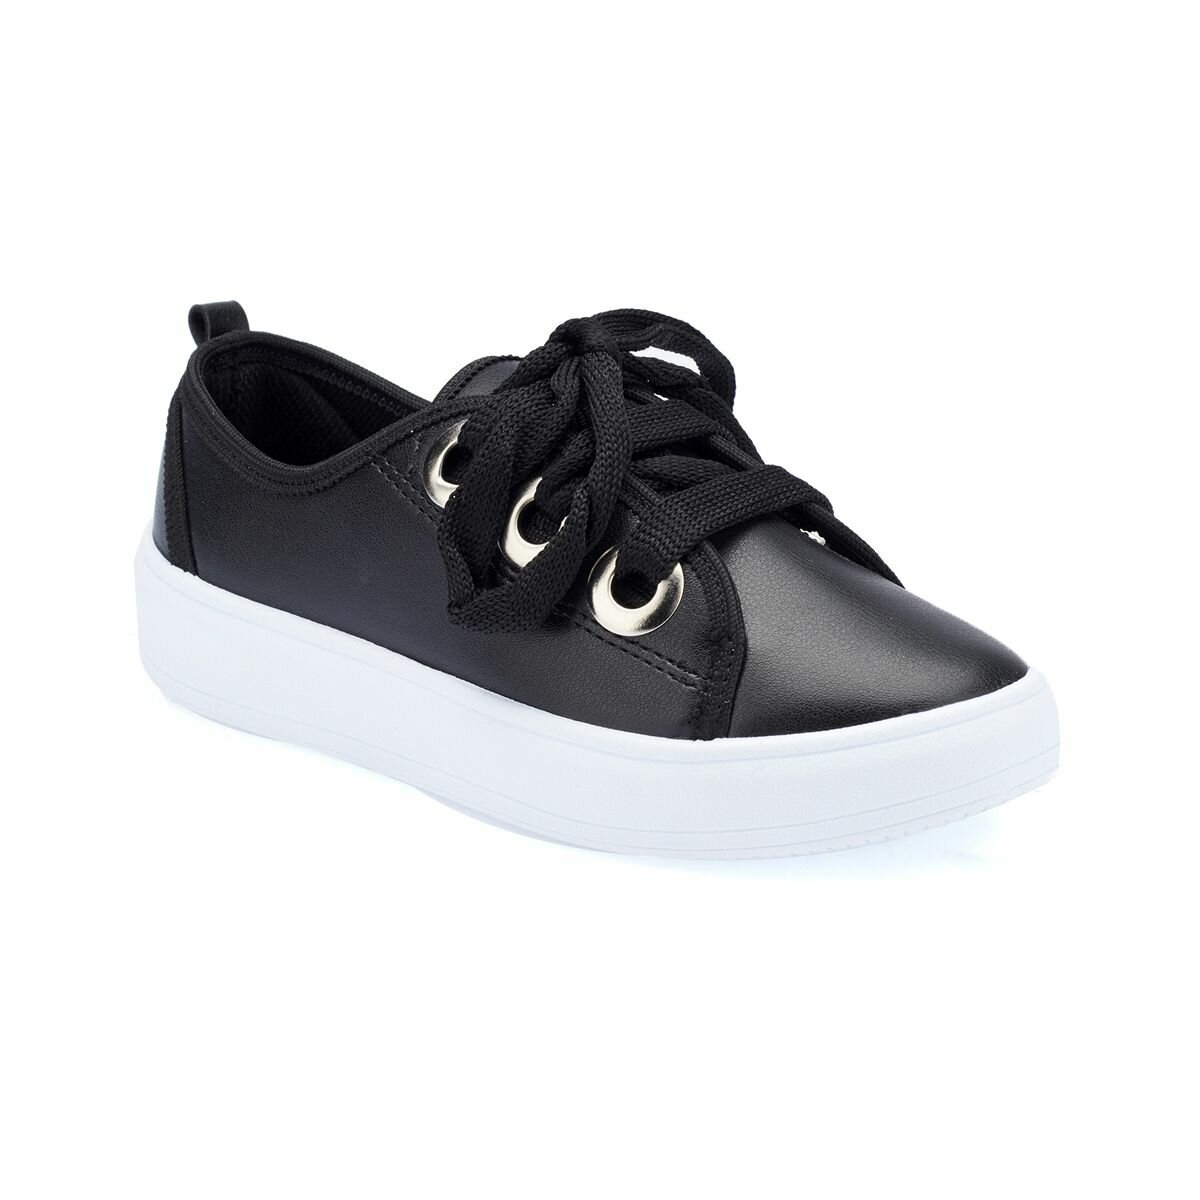 FLO 82. 510826.F Black Female Child Sneaker Shoes Polaris